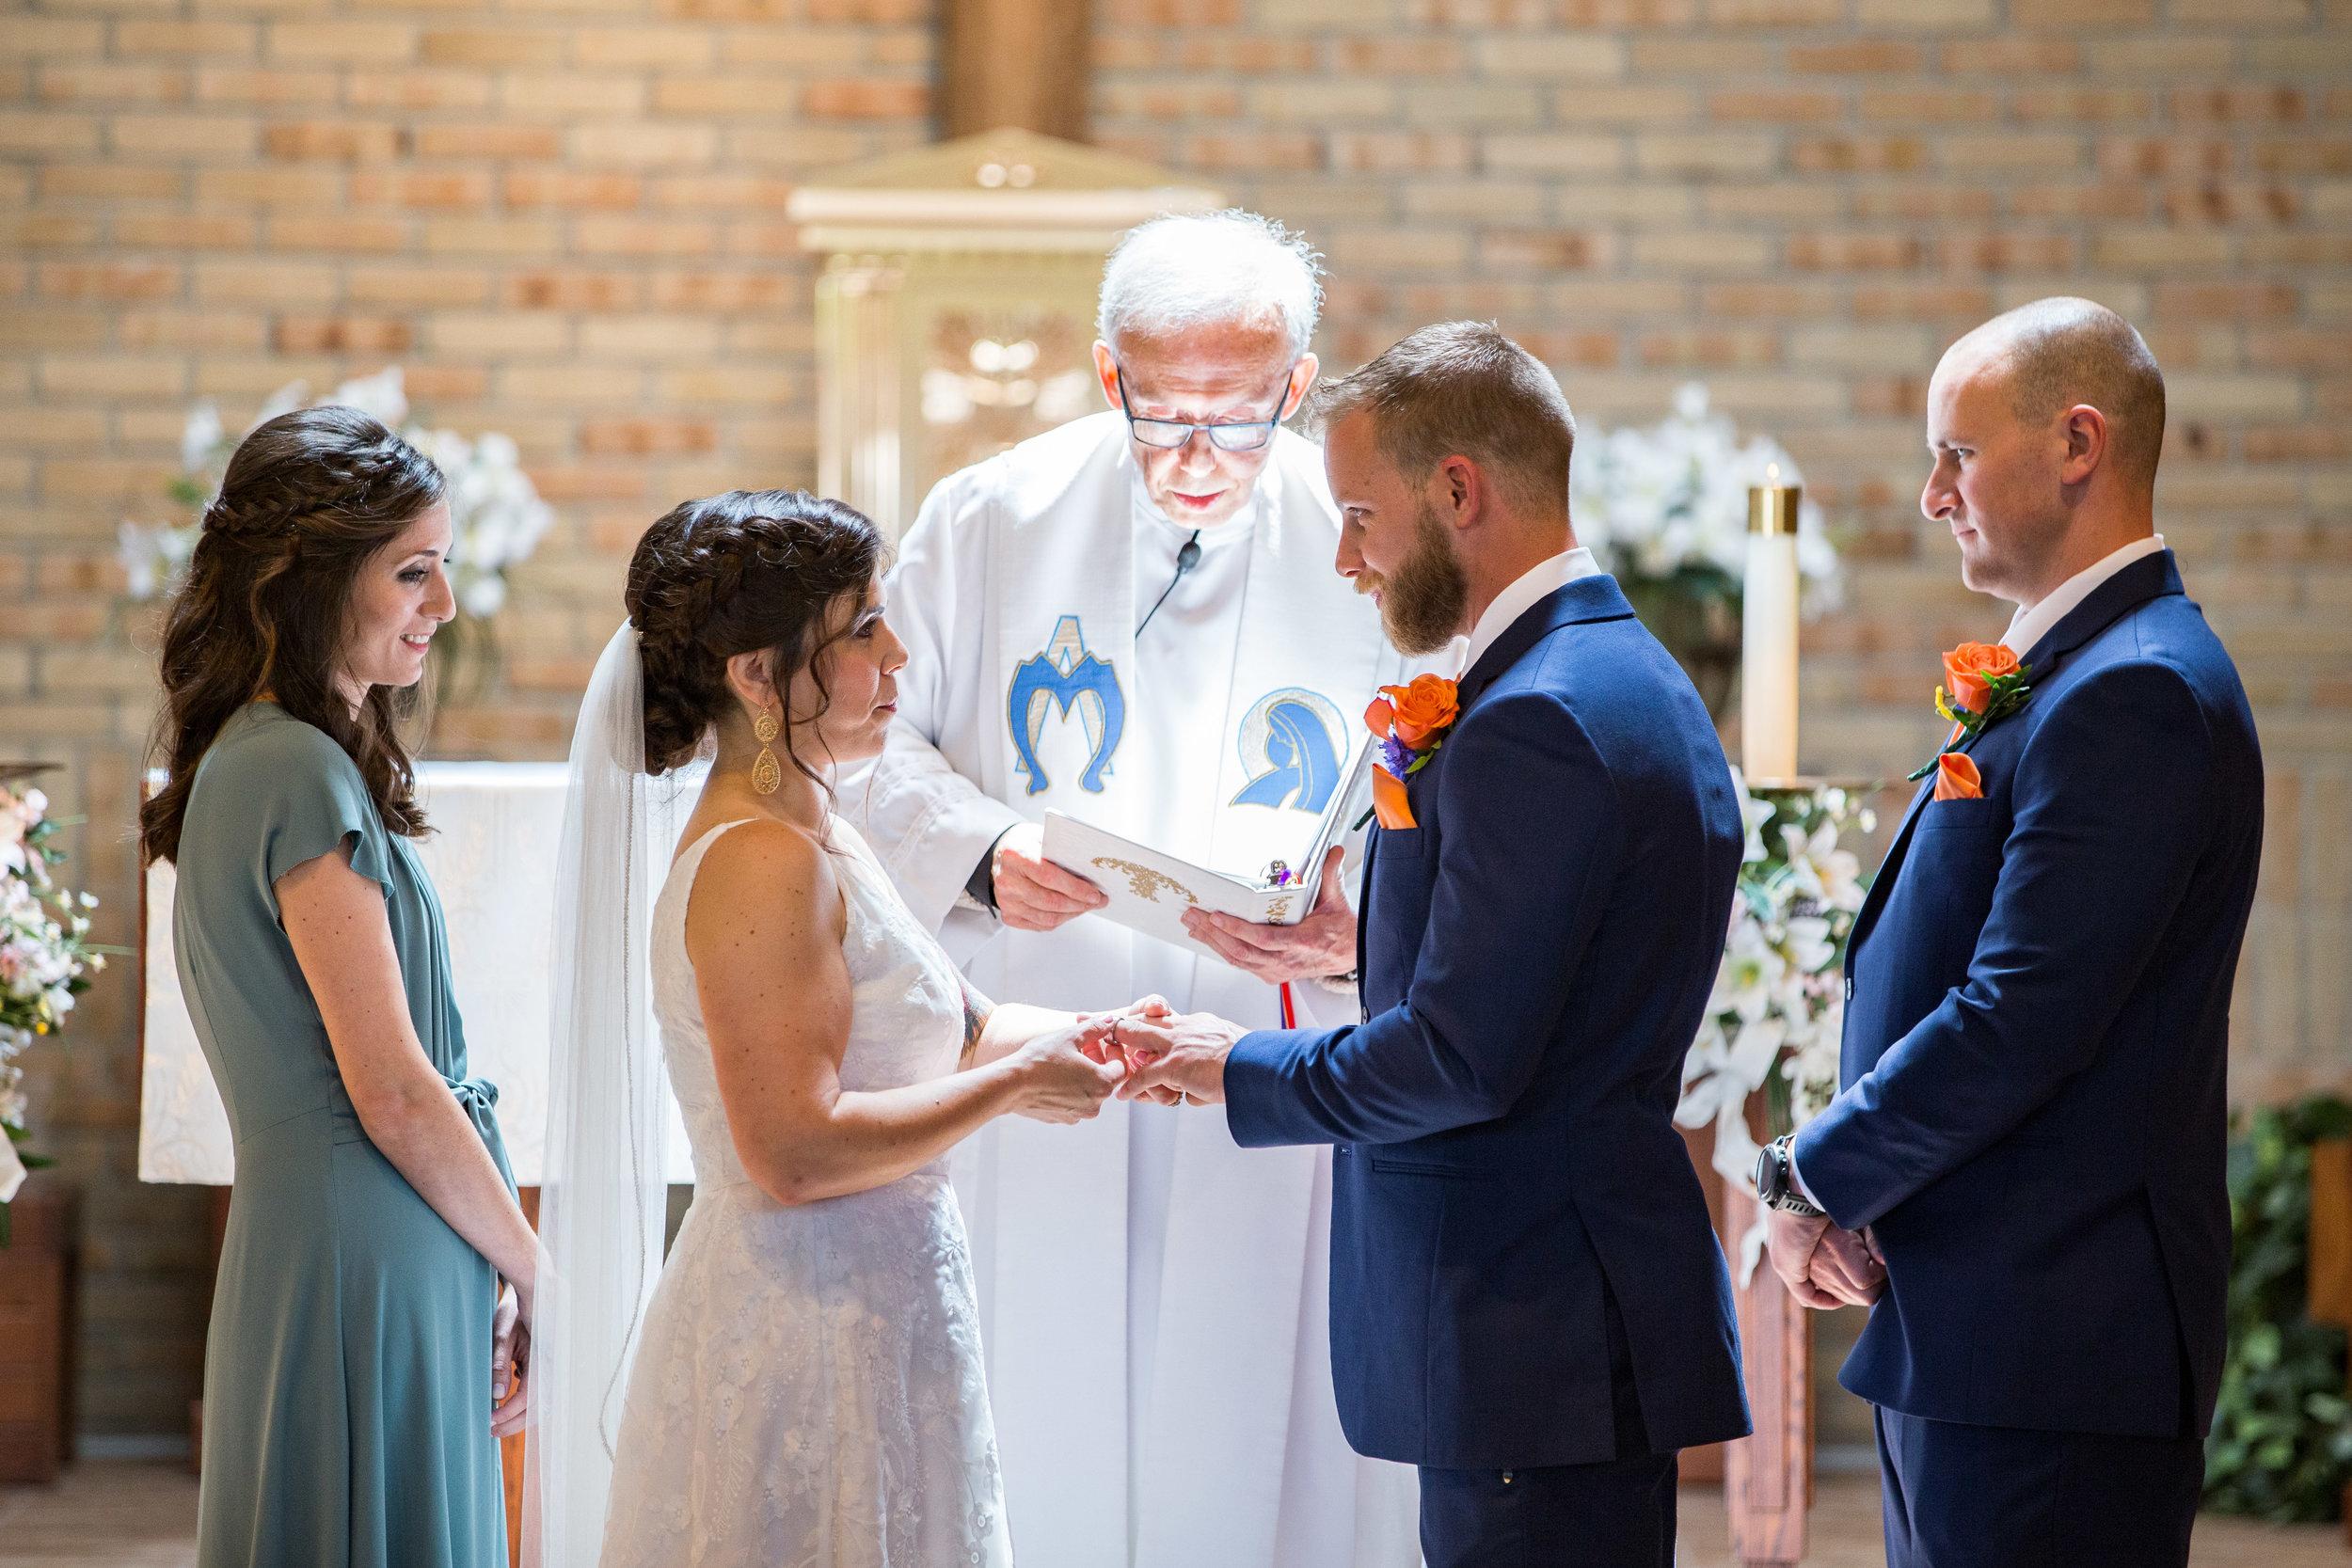 Natalie and Dallas Mooney Wedding 6-8-19_Tania Watt Photography-129.jpg